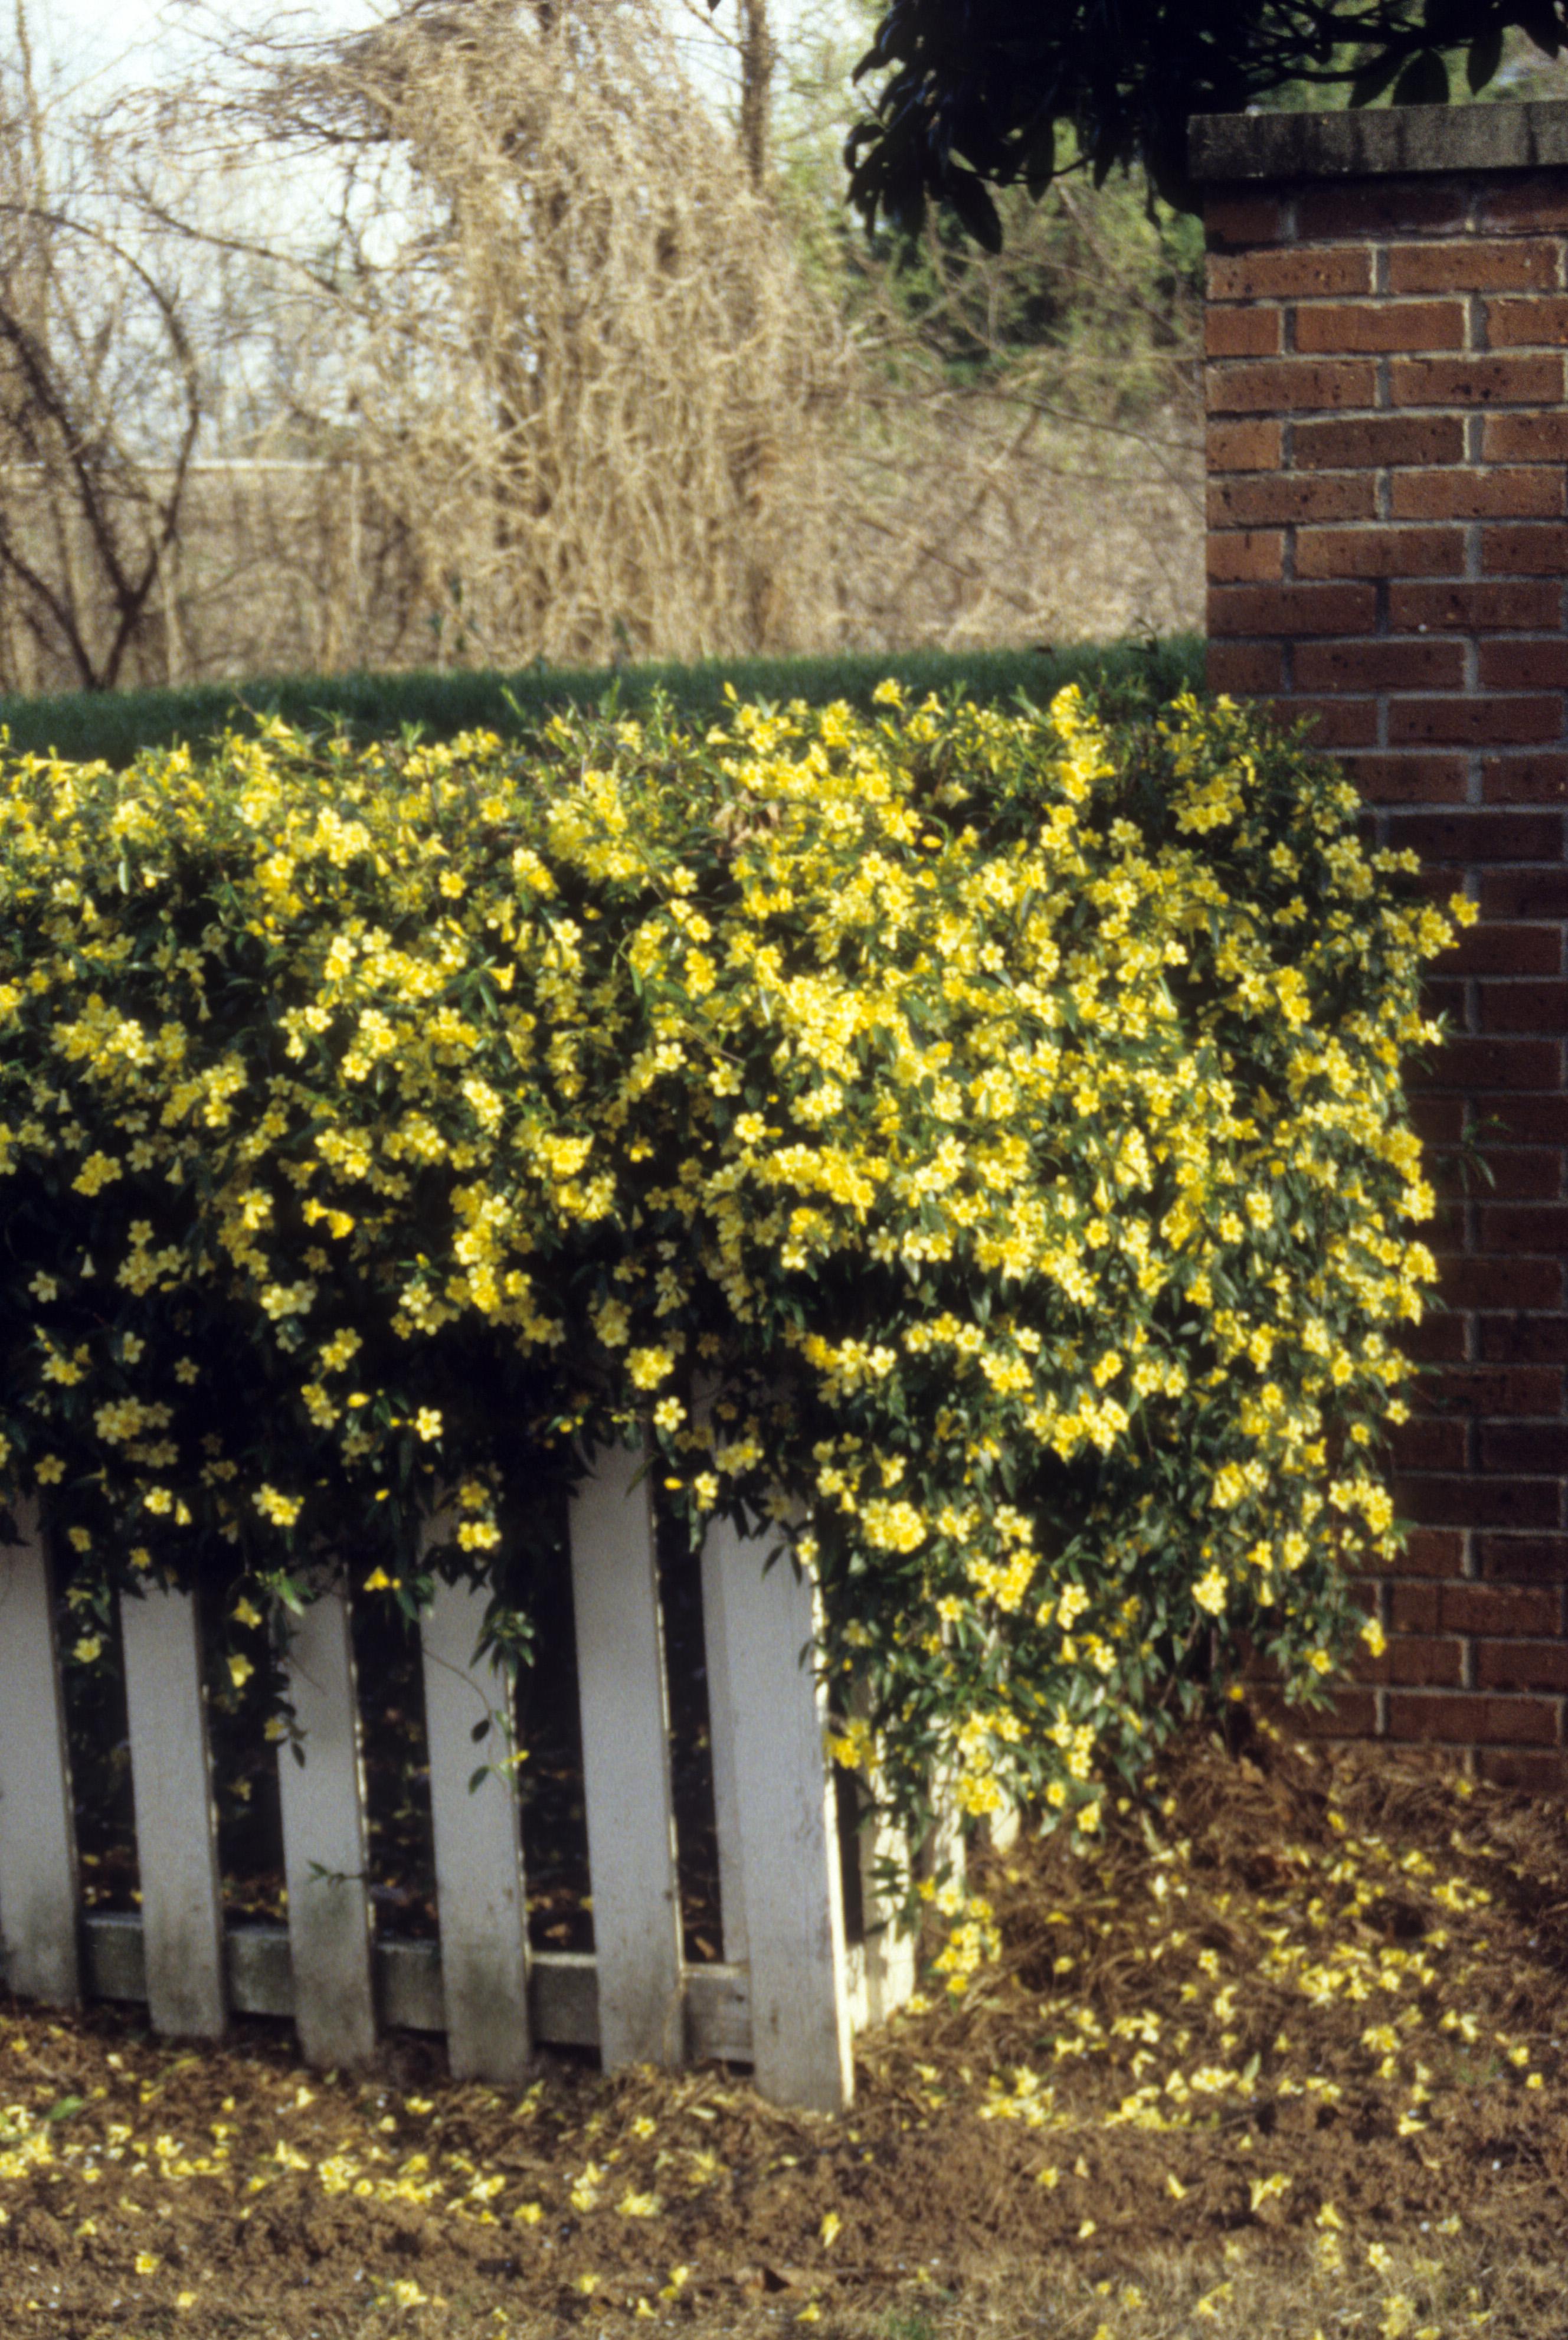 carolina jessamine  identification  walter reeves the georgia, Beautiful flower